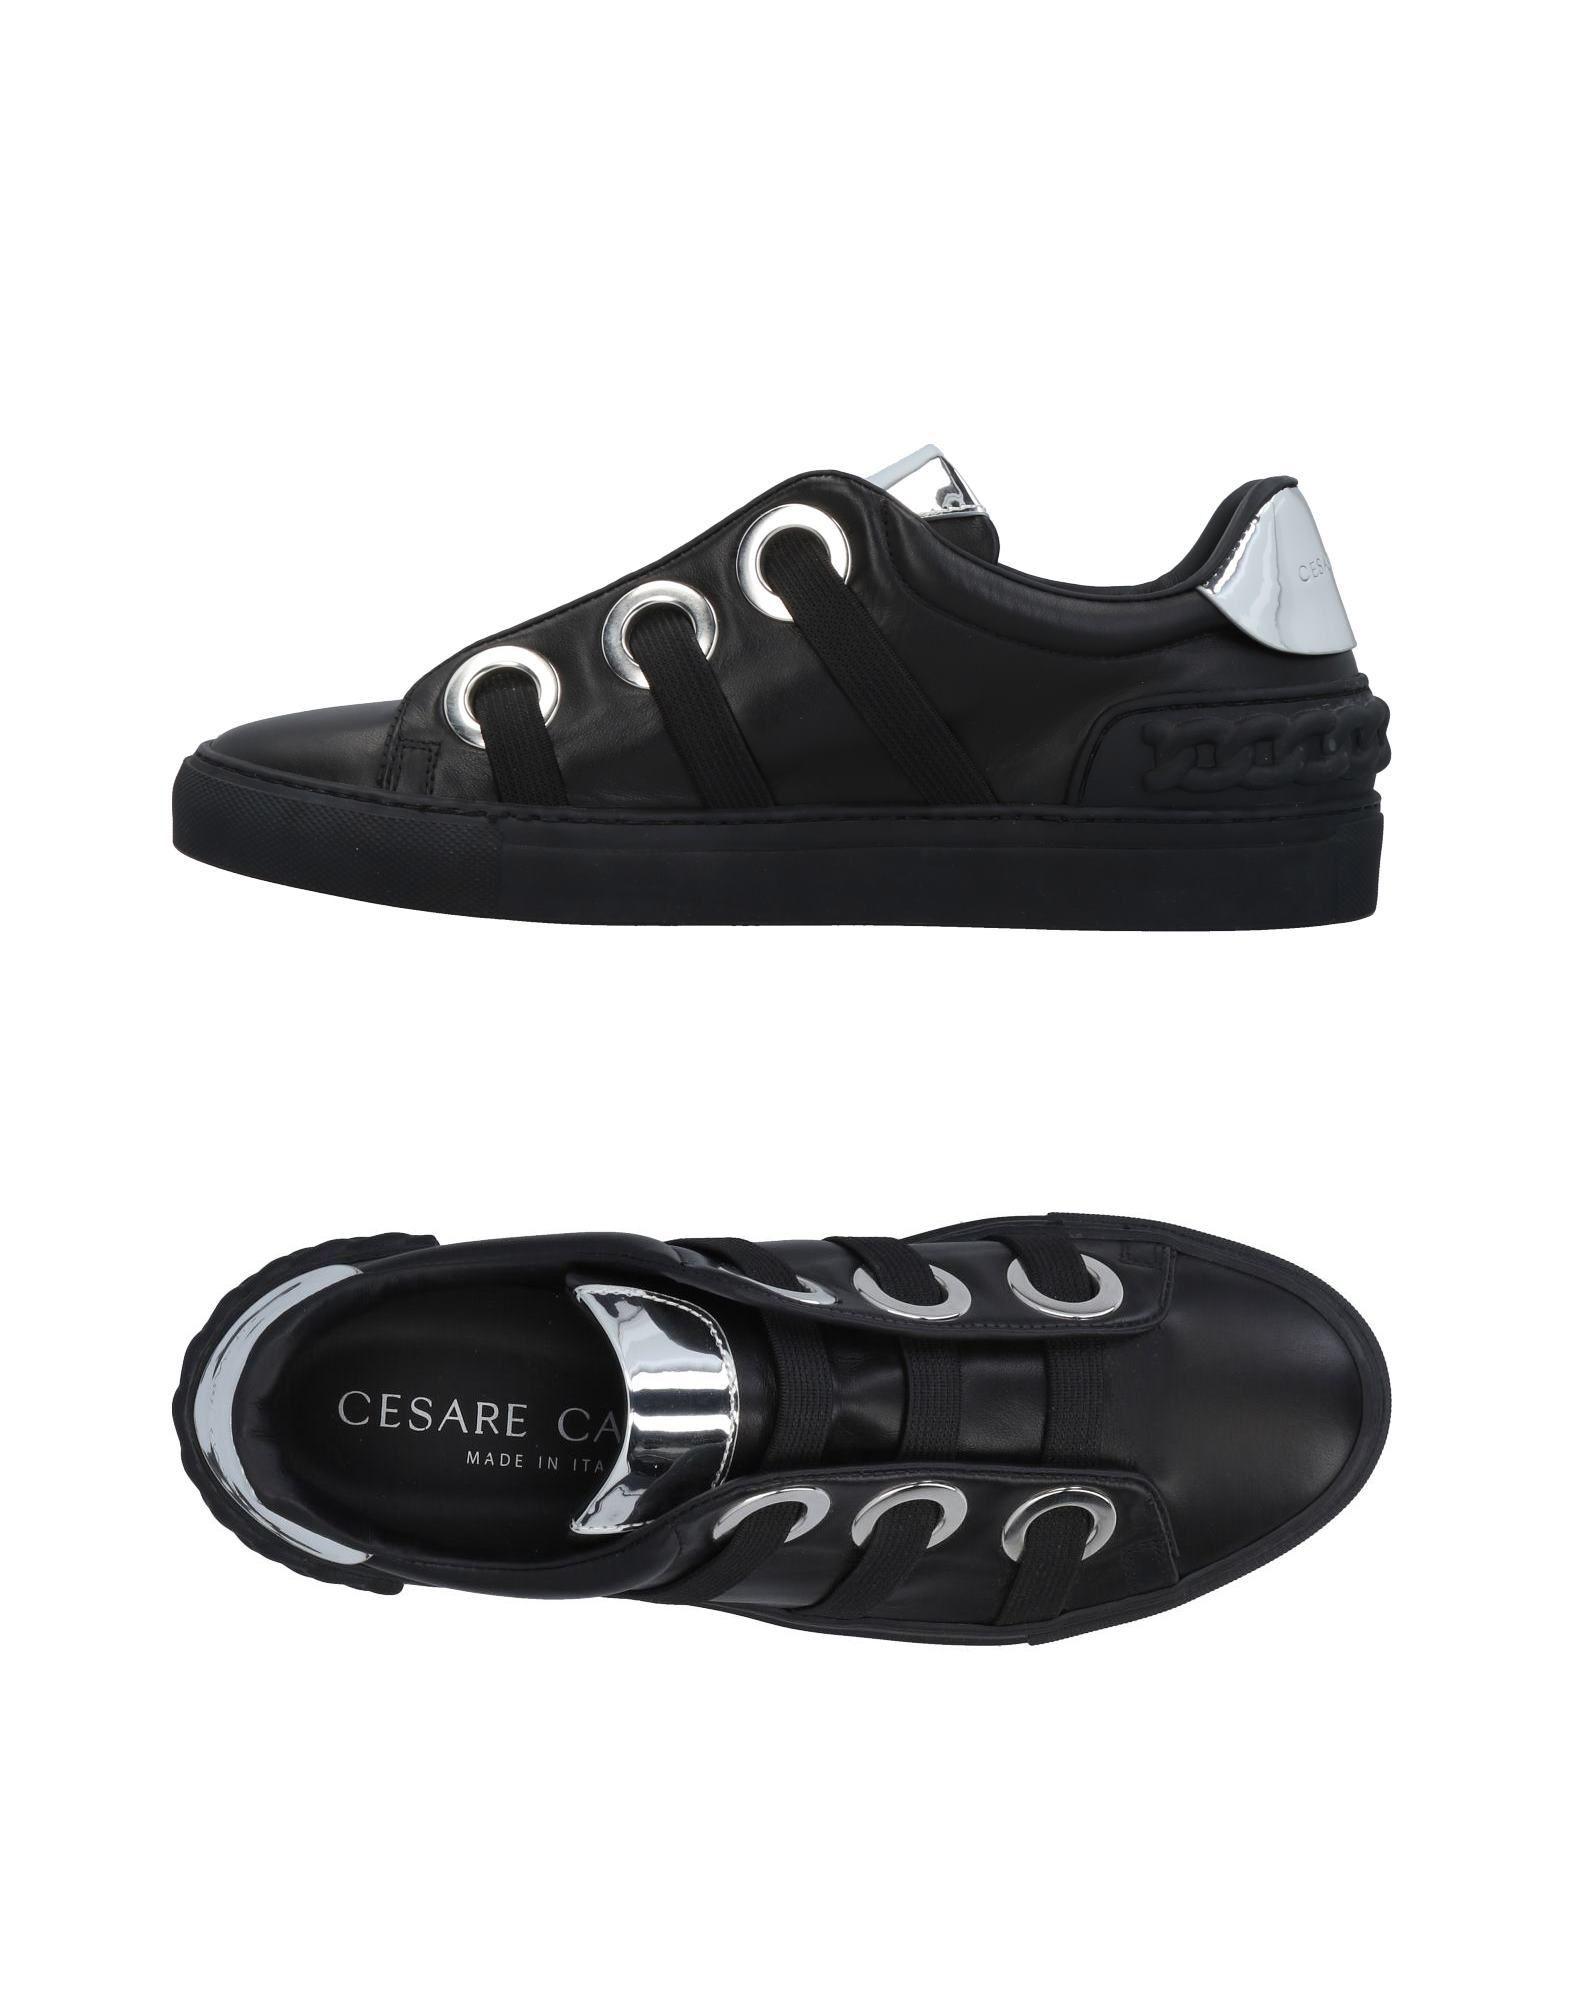 Cesare Casadei Sneakers Herren  11451003RQ Gute Qualität beliebte Schuhe